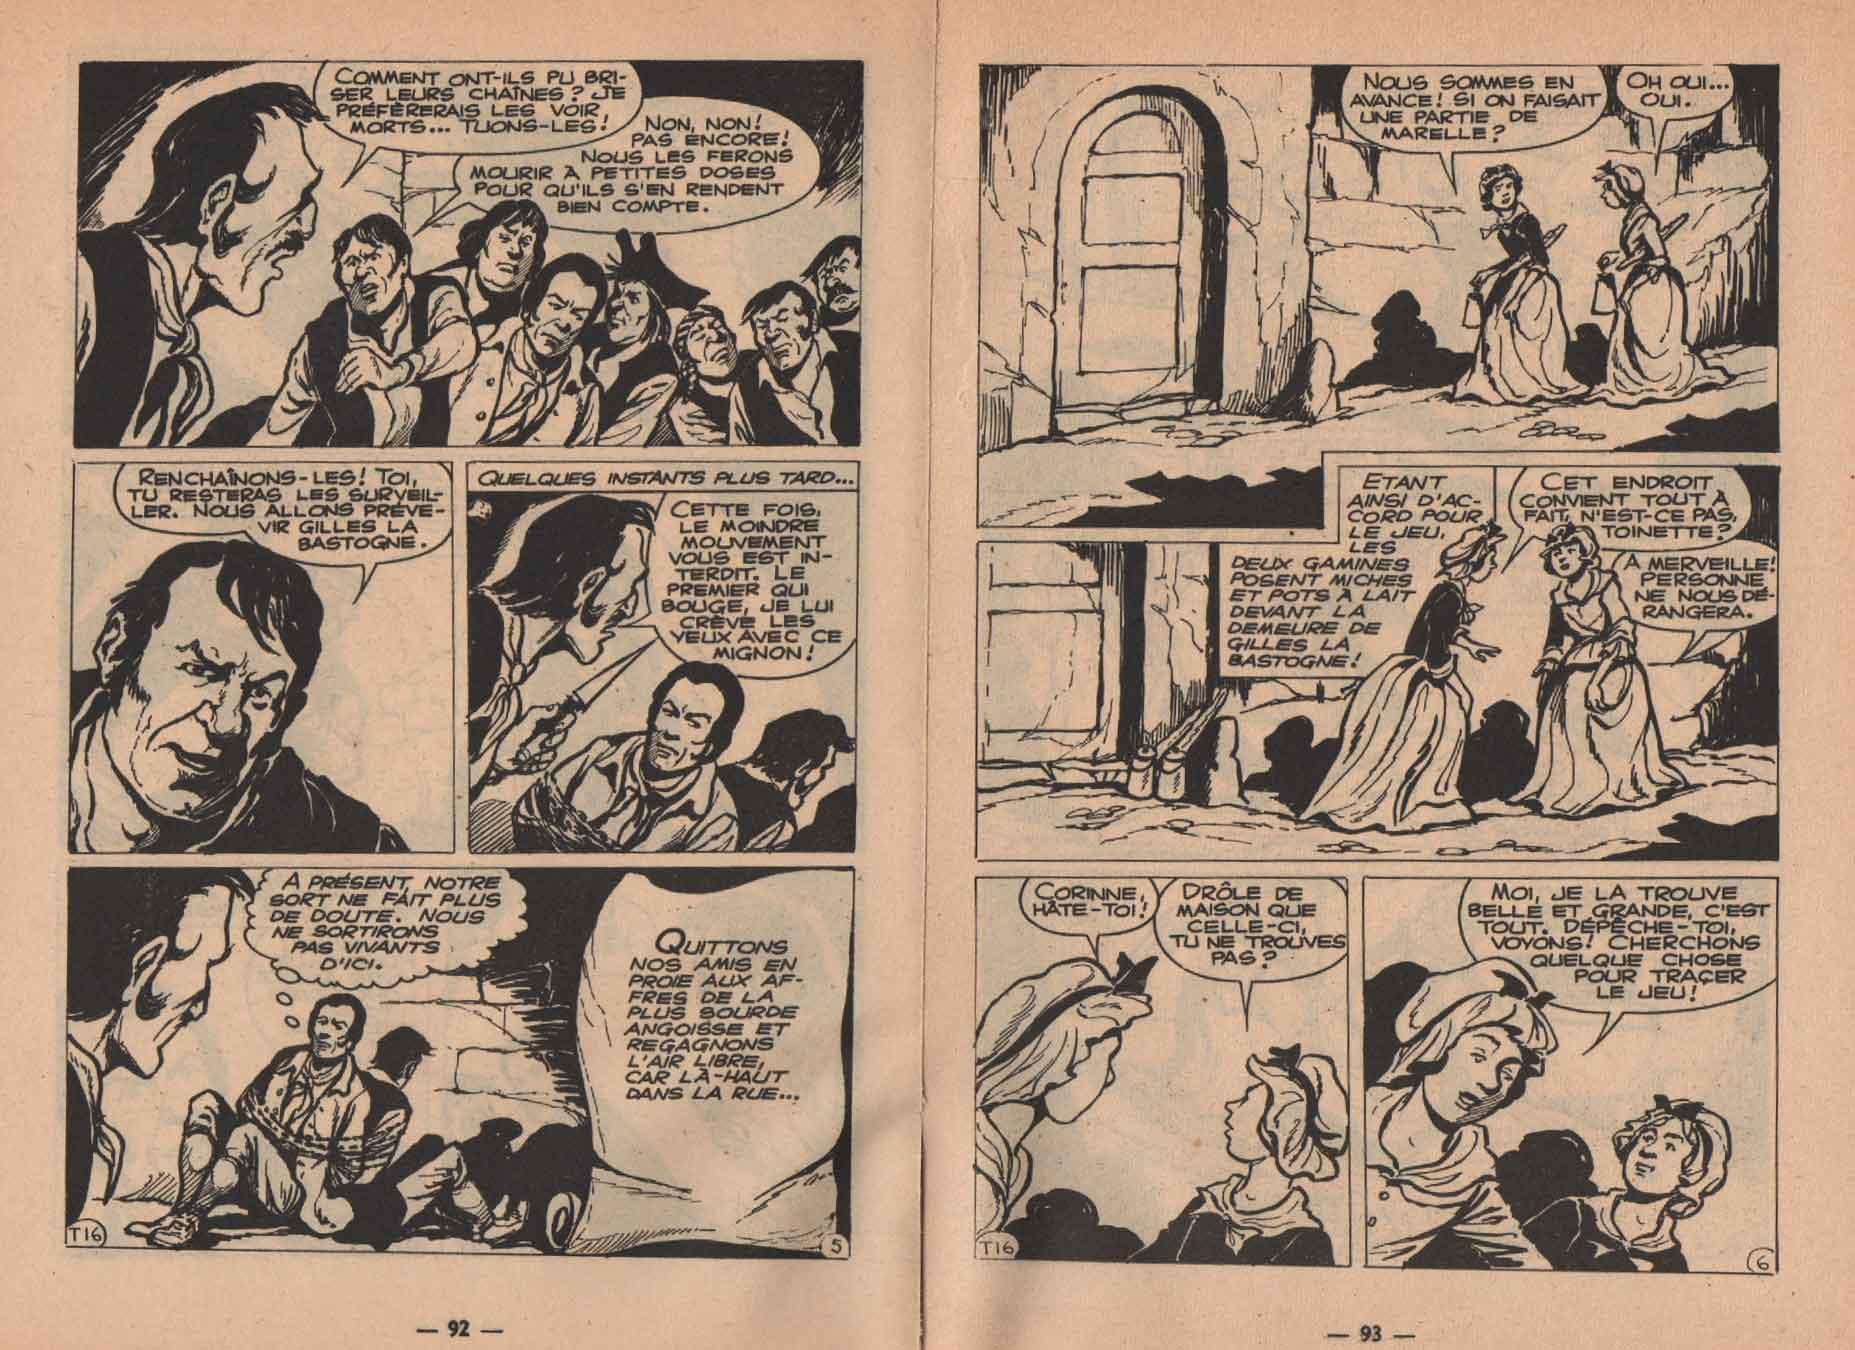 « Morin le Fort » Titan n° 16 (08/1964).